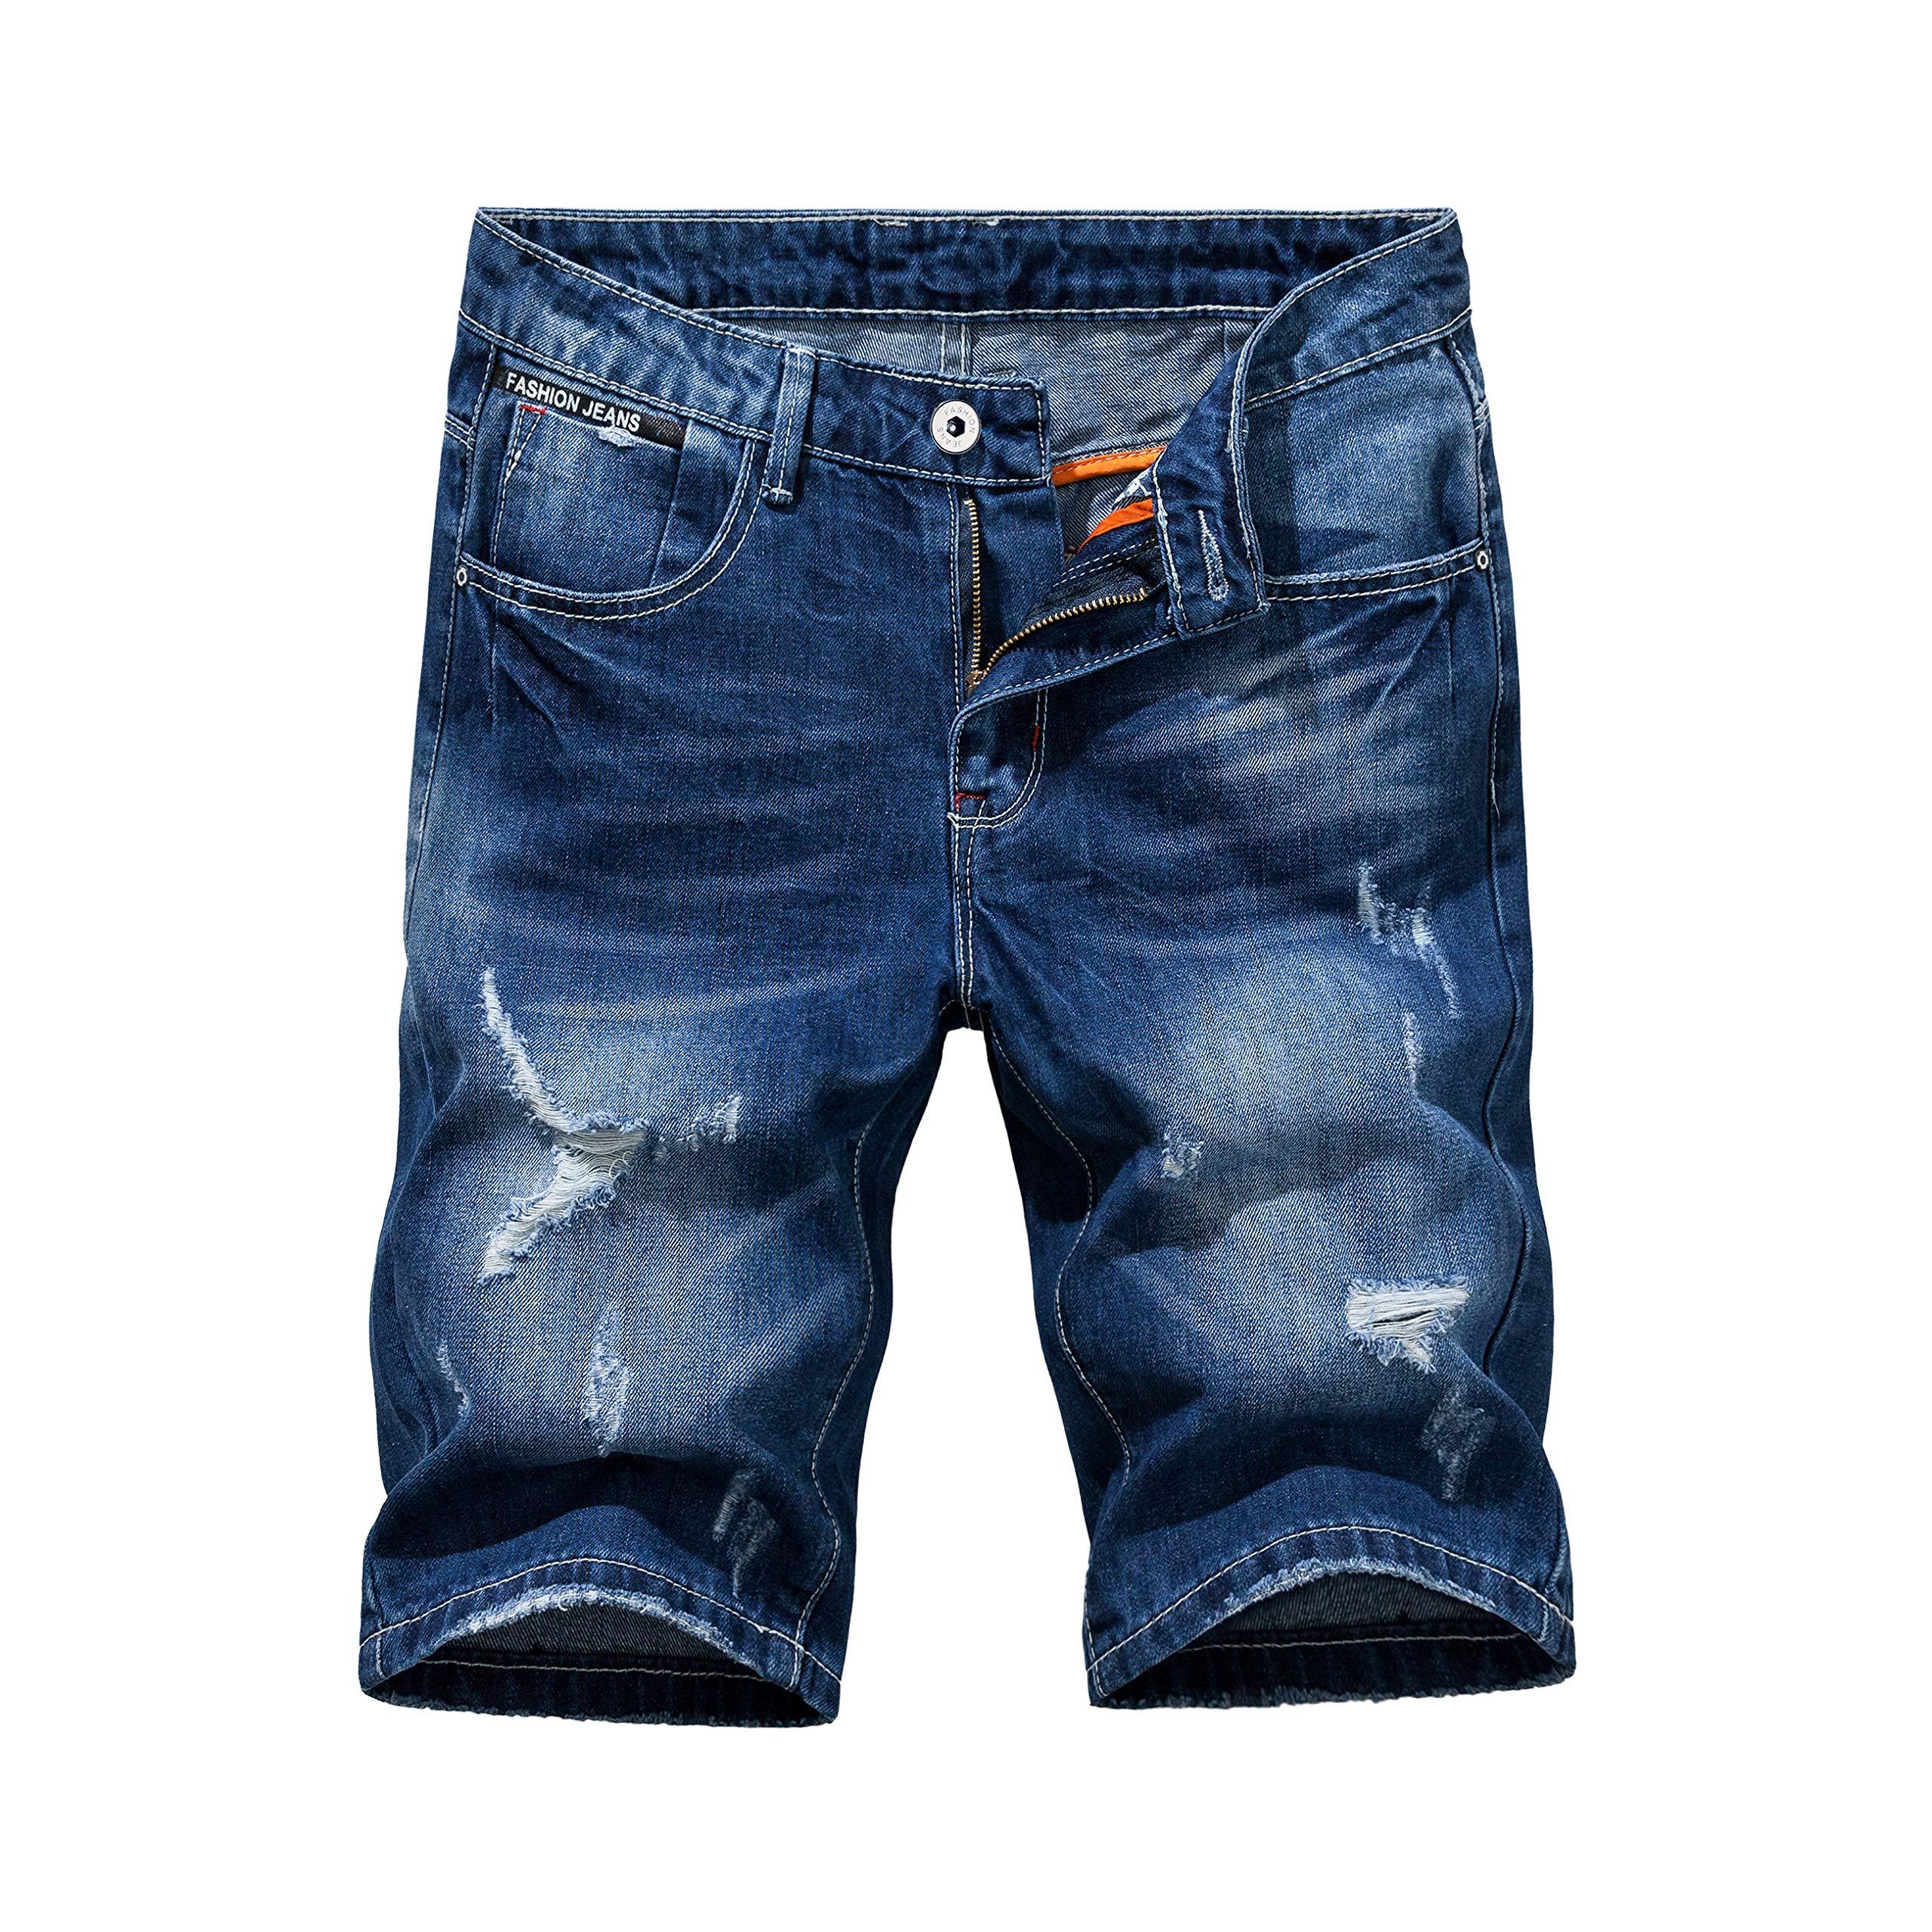 Heart Yuxuan Men's Fashion Slim Casual Denim Short (38, Dark Blue)